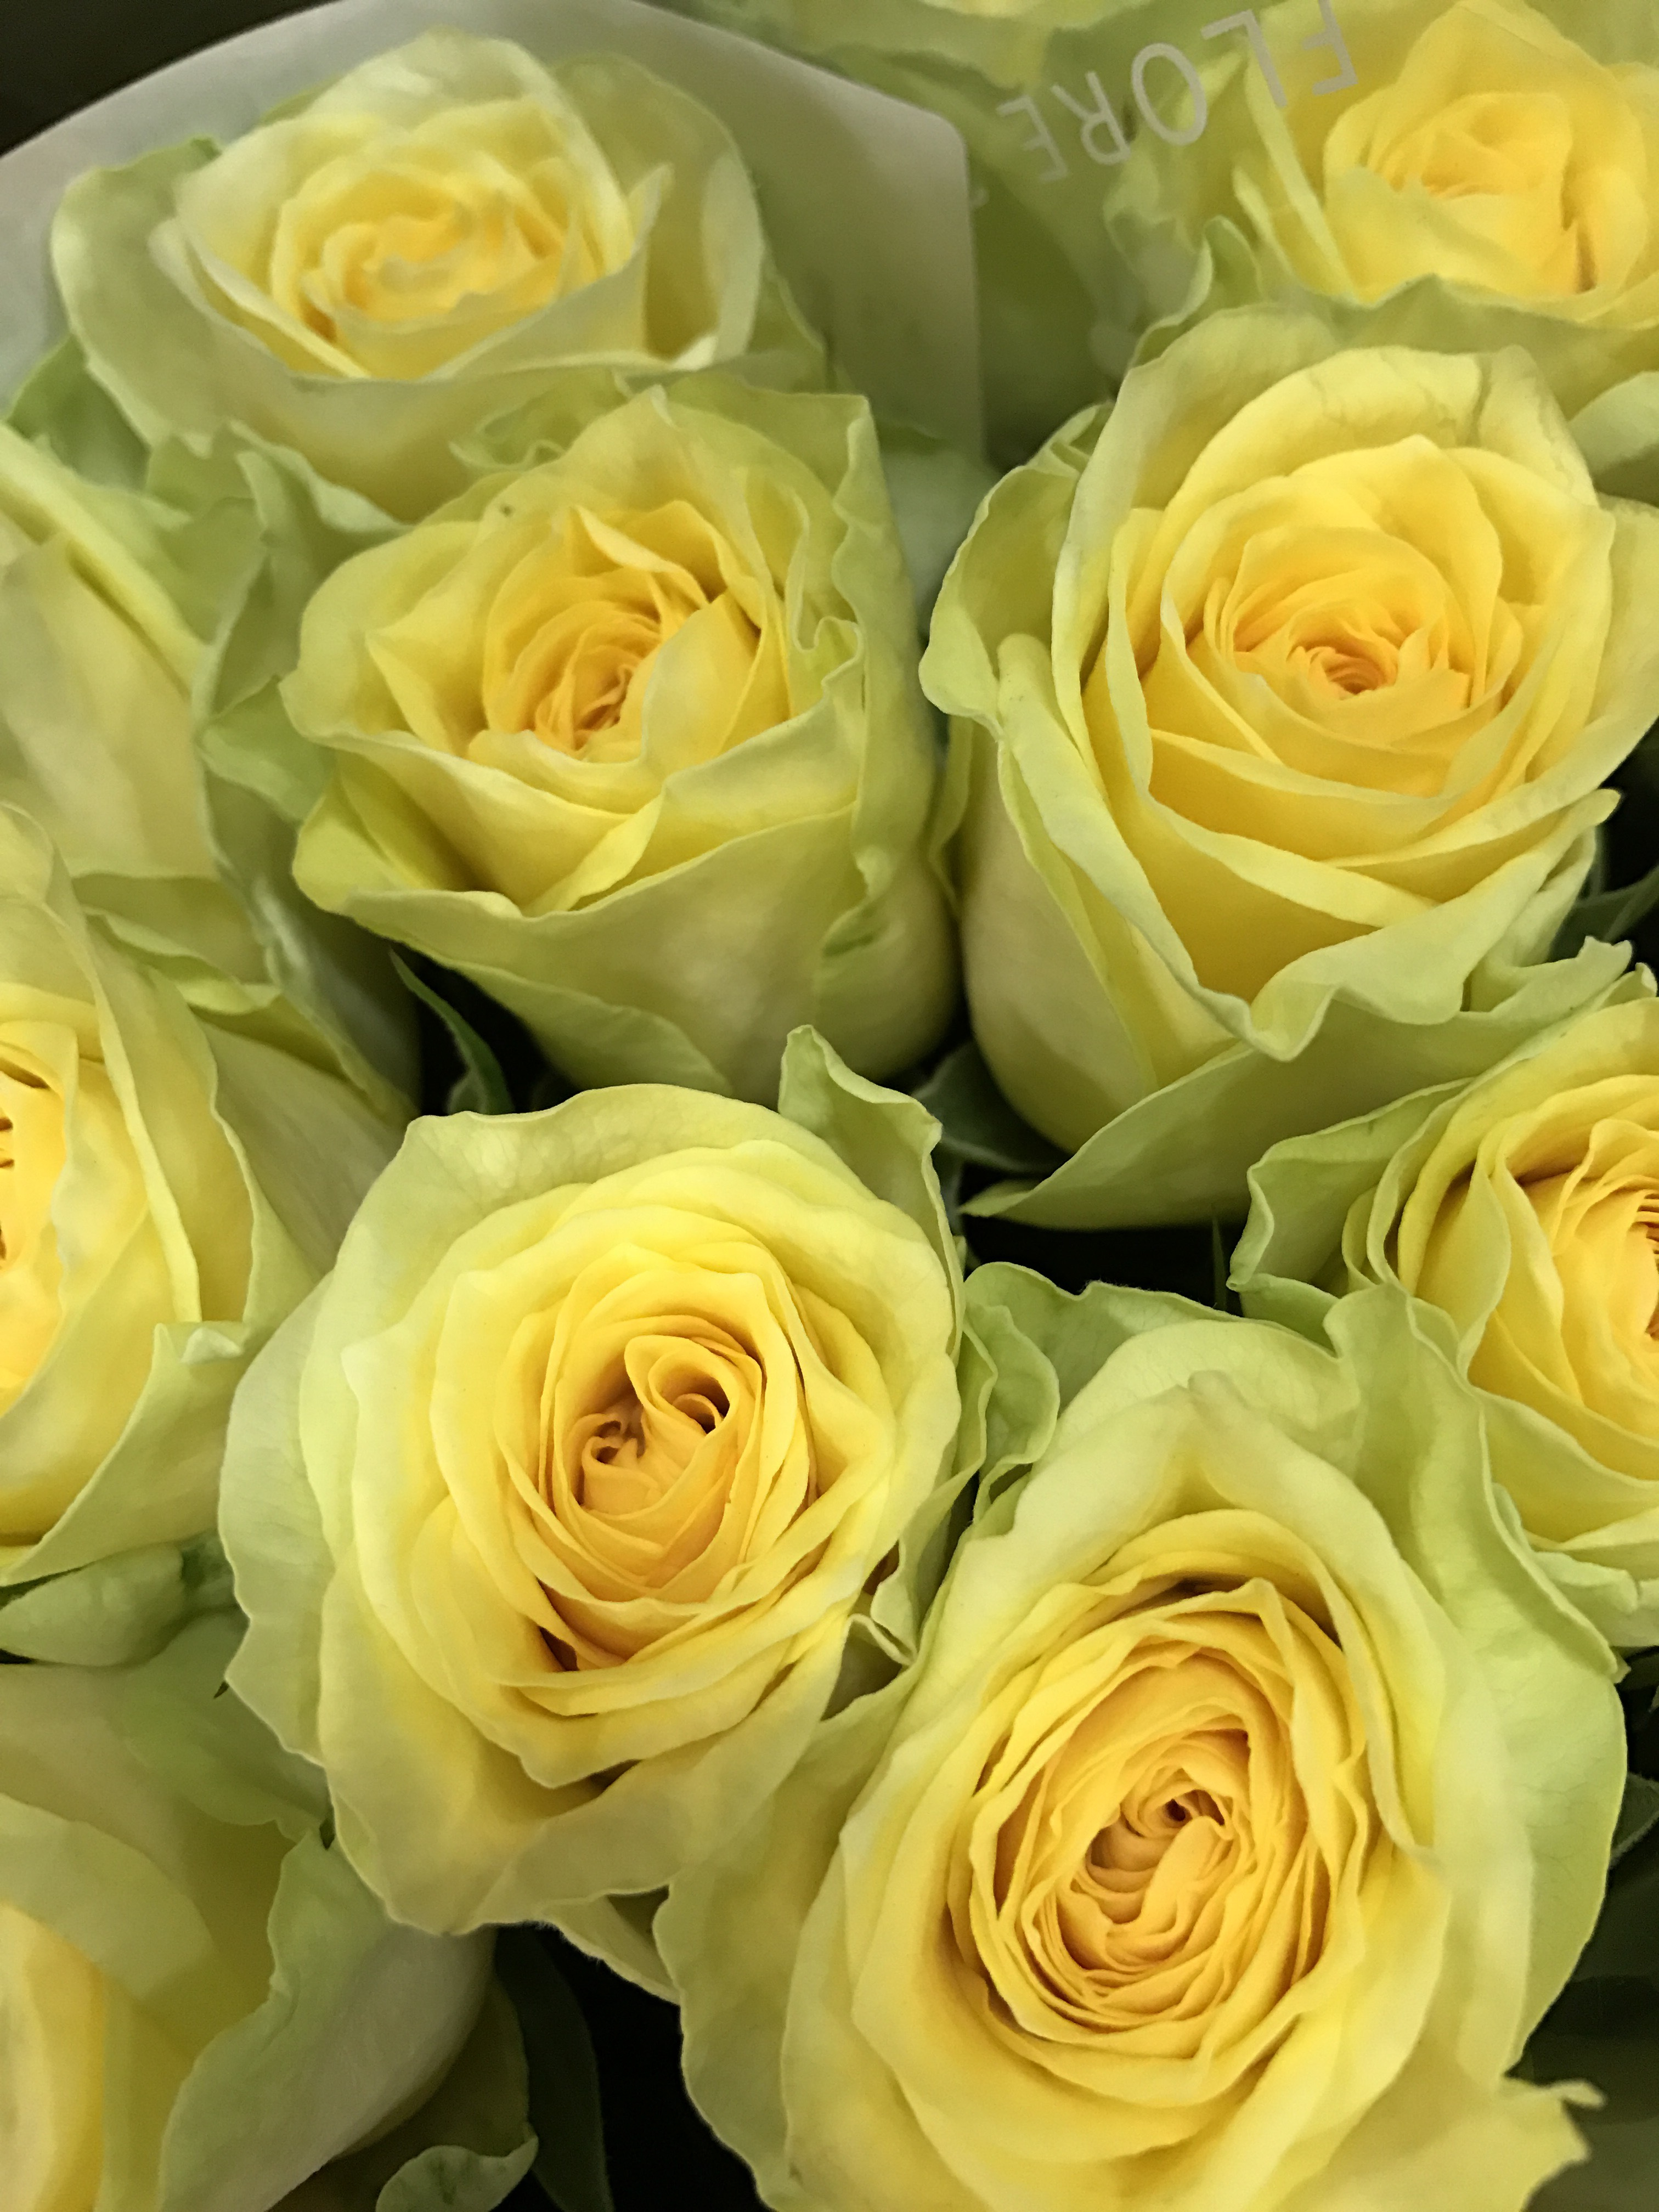 http://flore21.com/contents/ota/IMG_4220.JPG